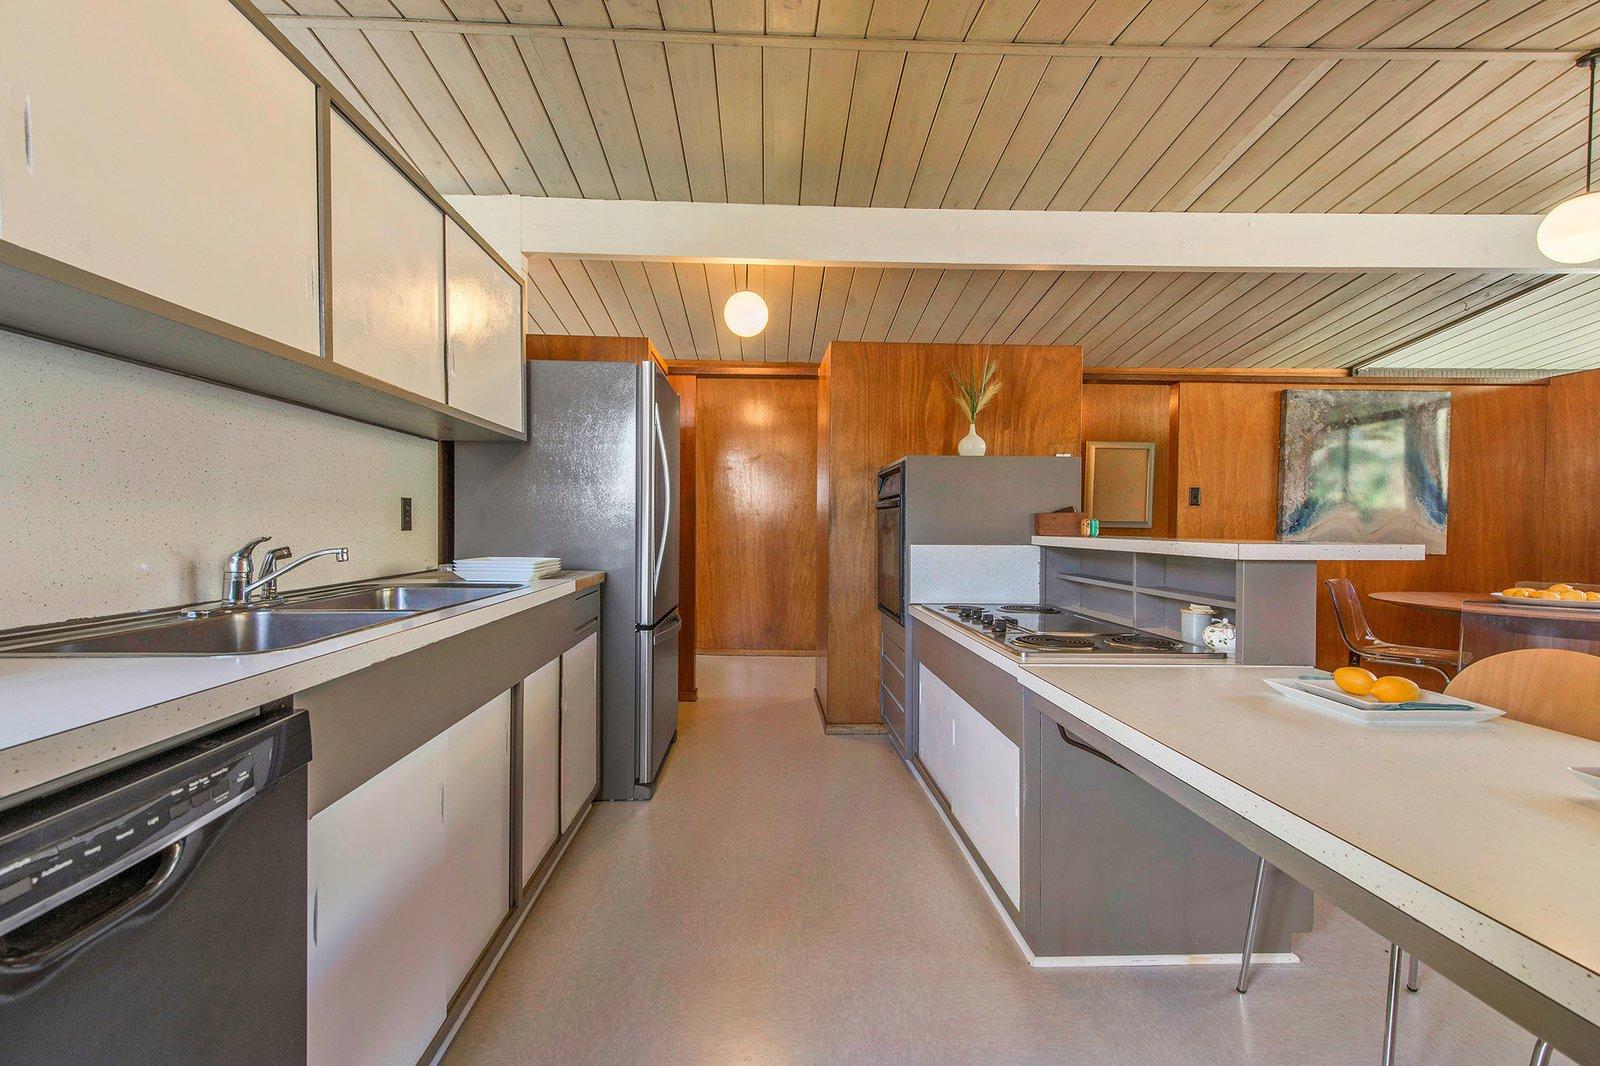 San Rafael Eichler Home kitchen